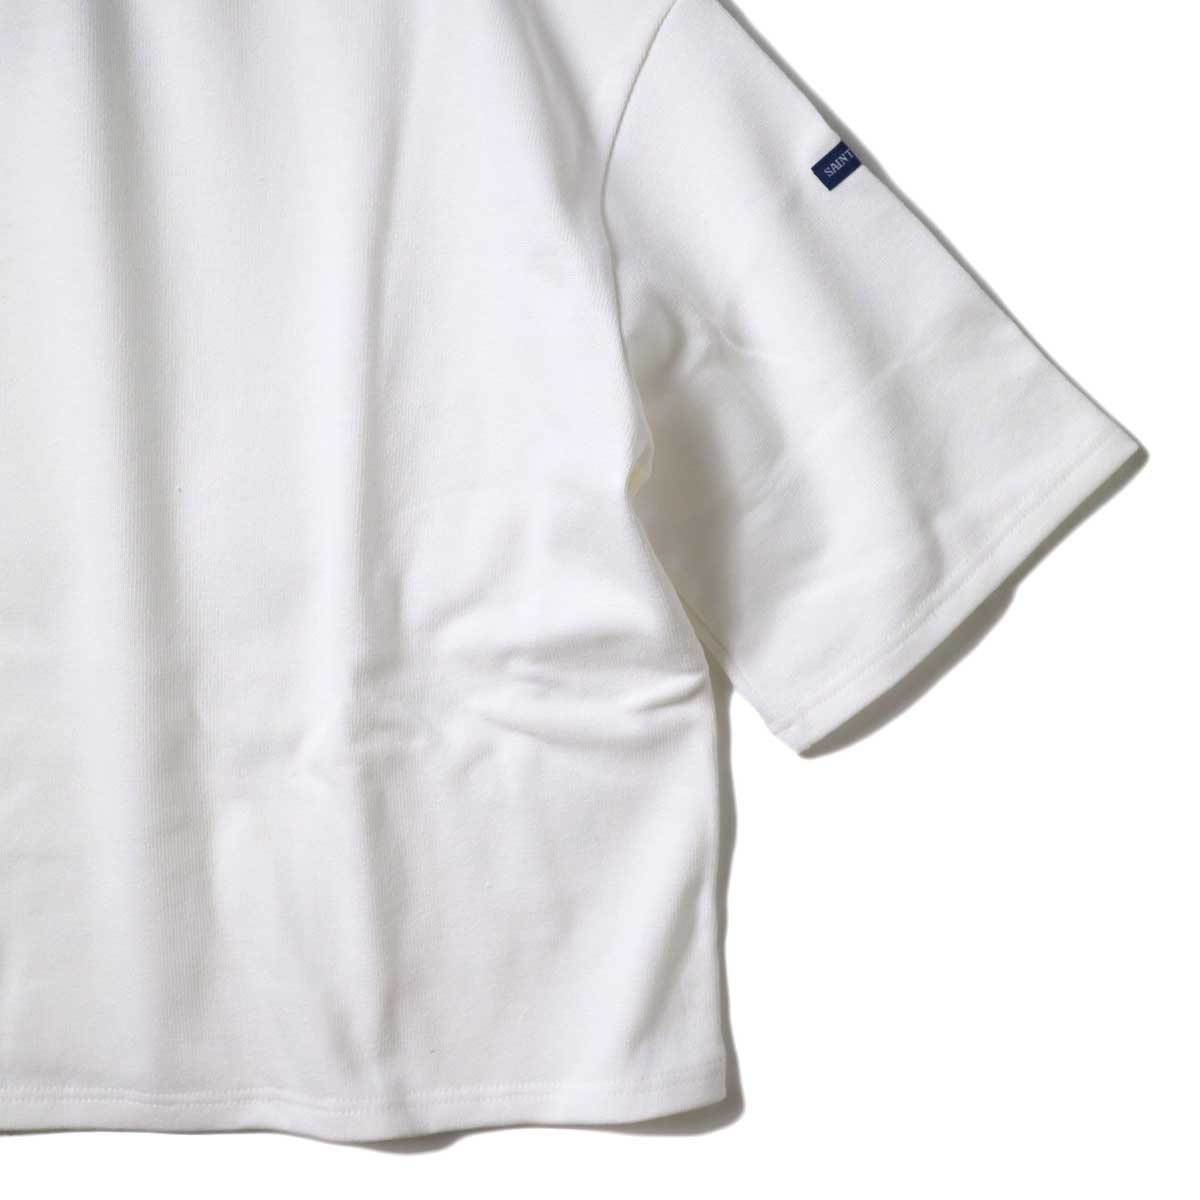 SAINT JAMES / OUESSANT SHORT SLEEVE SHIRTS (Neige) 裾・袖